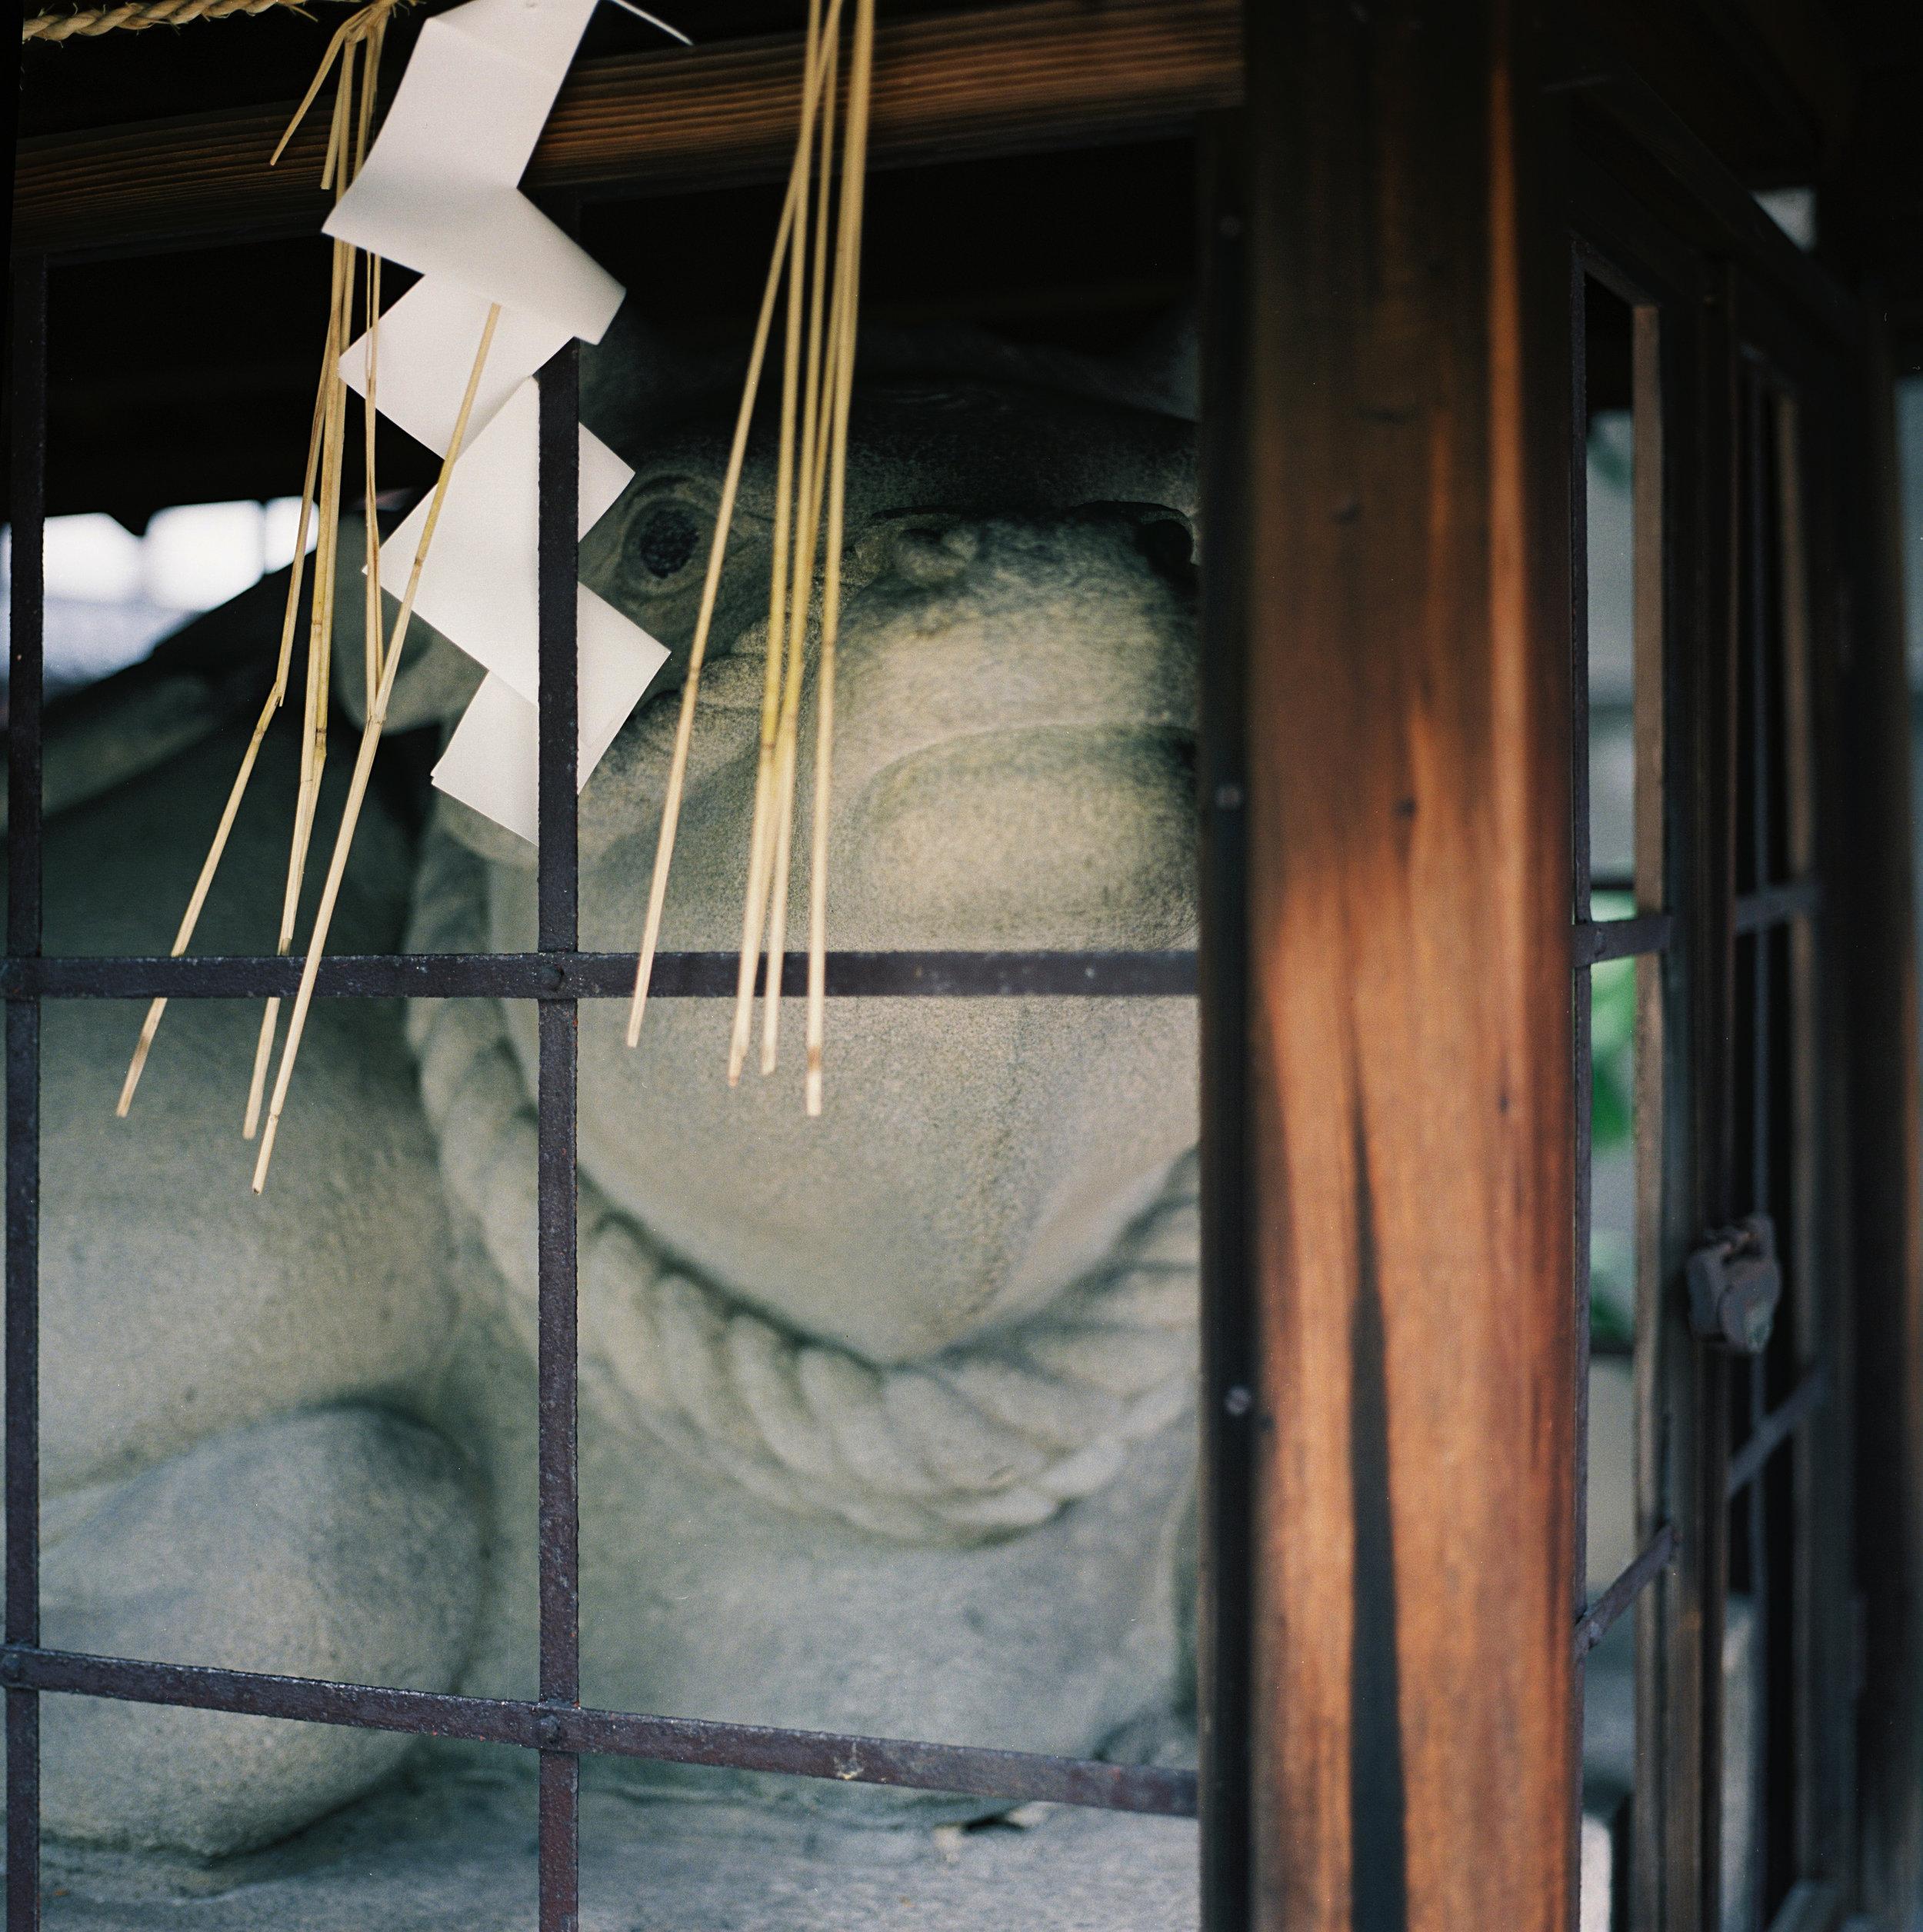 Kandaijin, Shimogyo-ku, Kyoto, Japan 2012